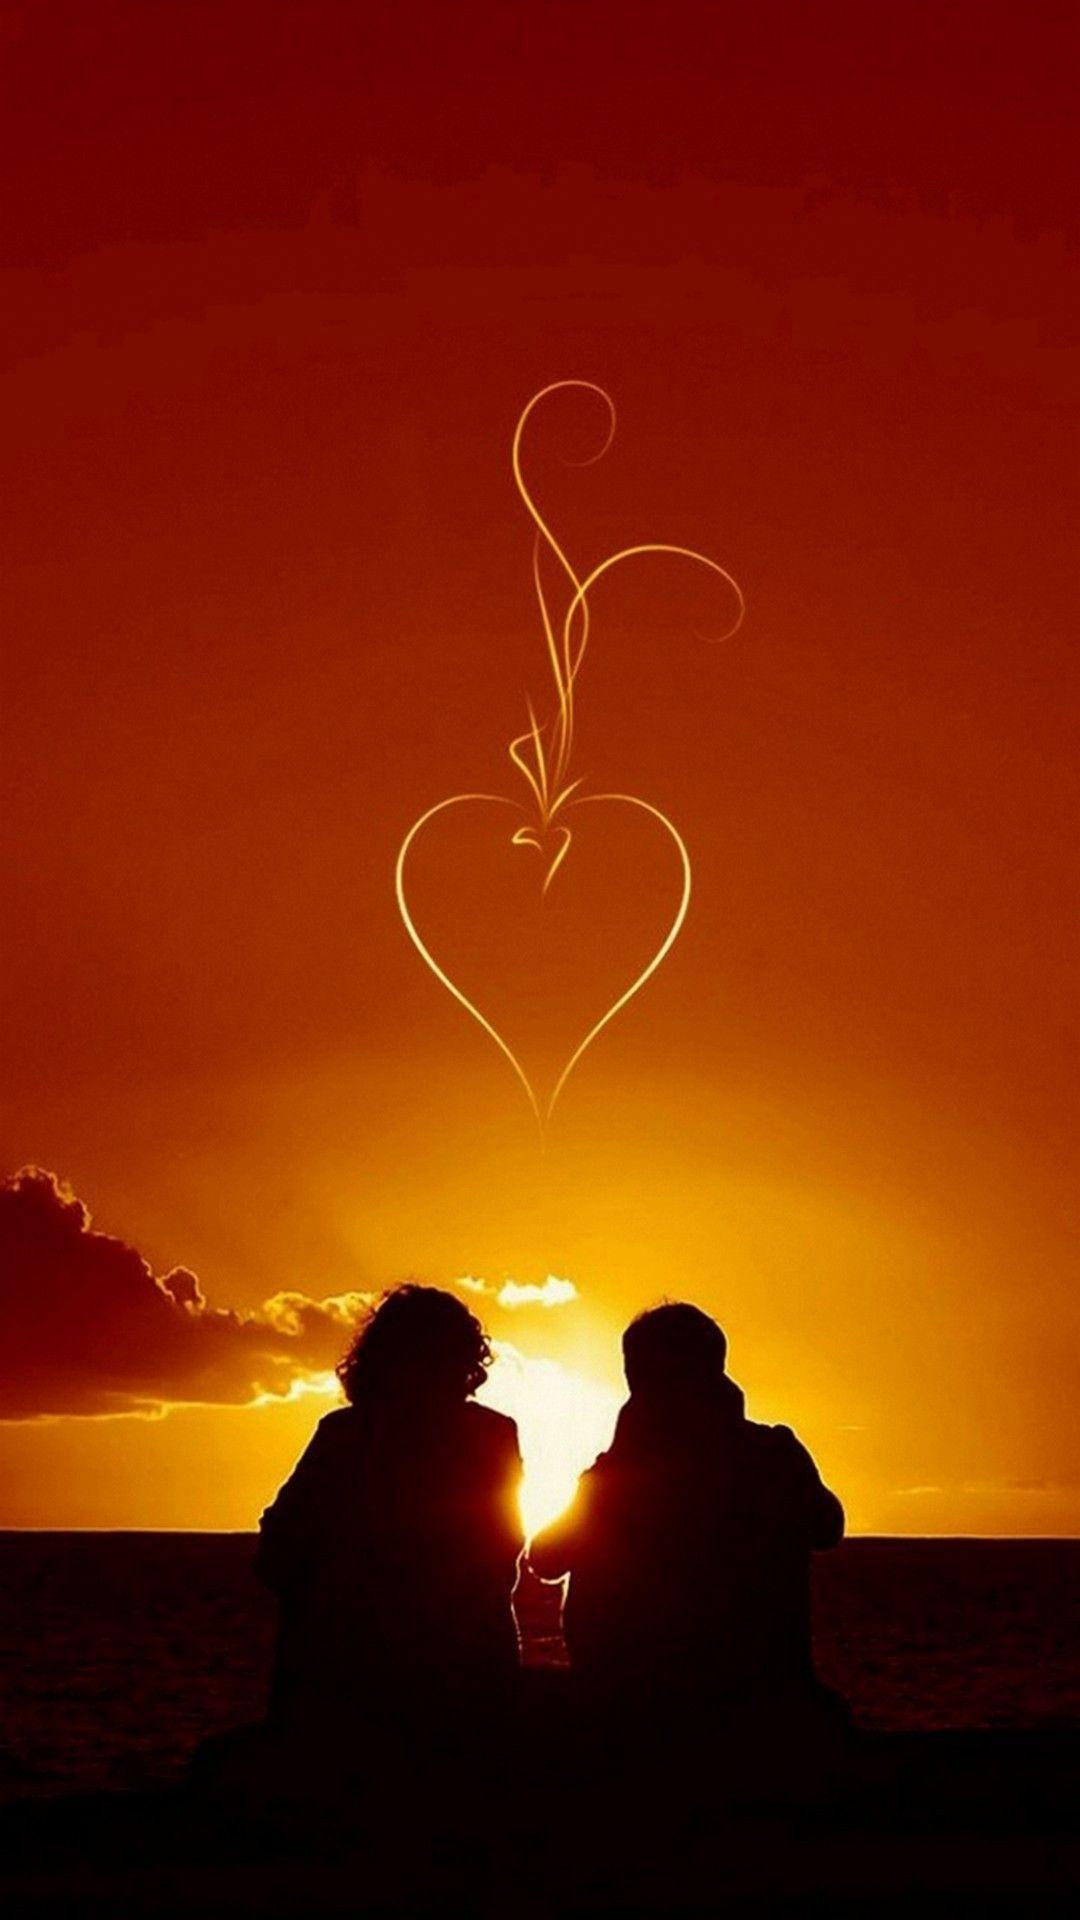 Hearts Love Motorola One Fusion Hd Wallpapers 1080x1920 Heart Wallpaper Love Wallpaper Download Love Wallpaper